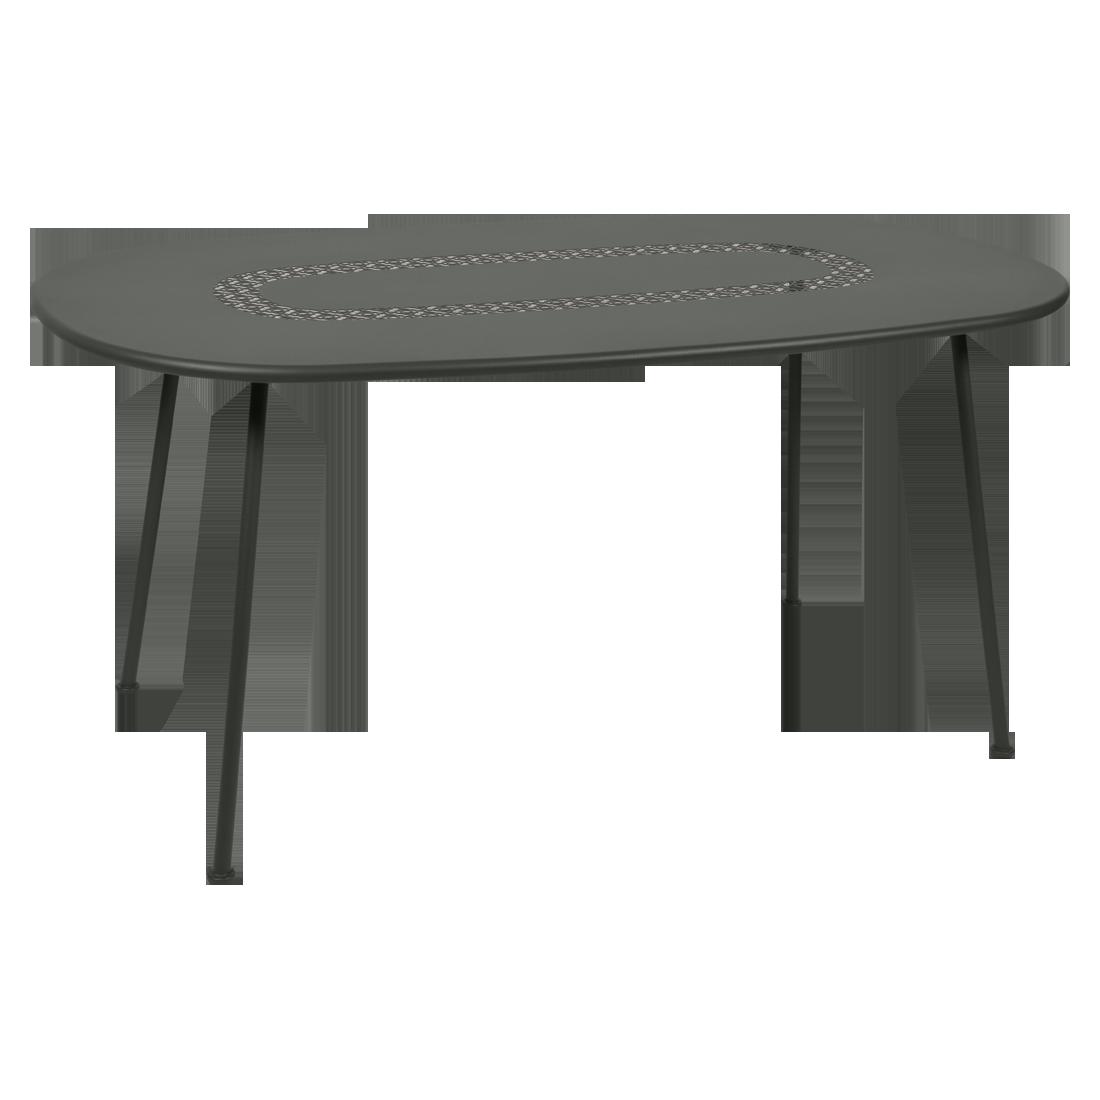 Table ovale Lorette romarin